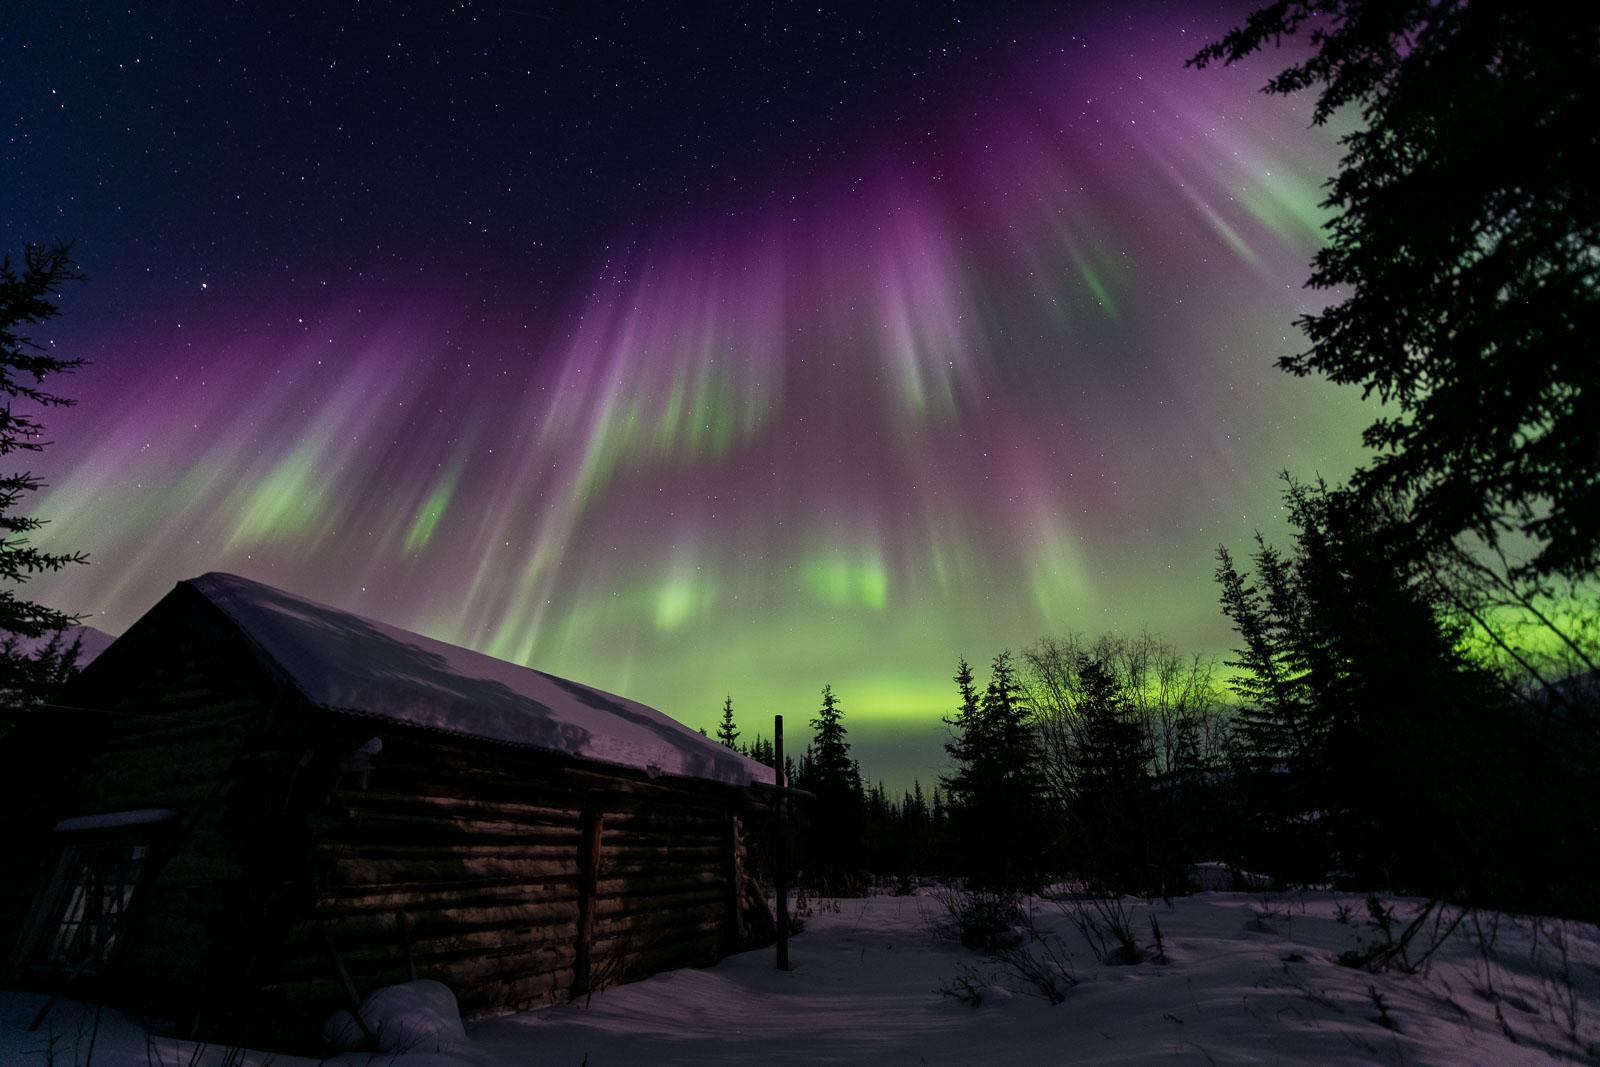 The aurora borealis fills the sky over the Kalhabuk Memorial Chapel in Wiseman, Alaska.